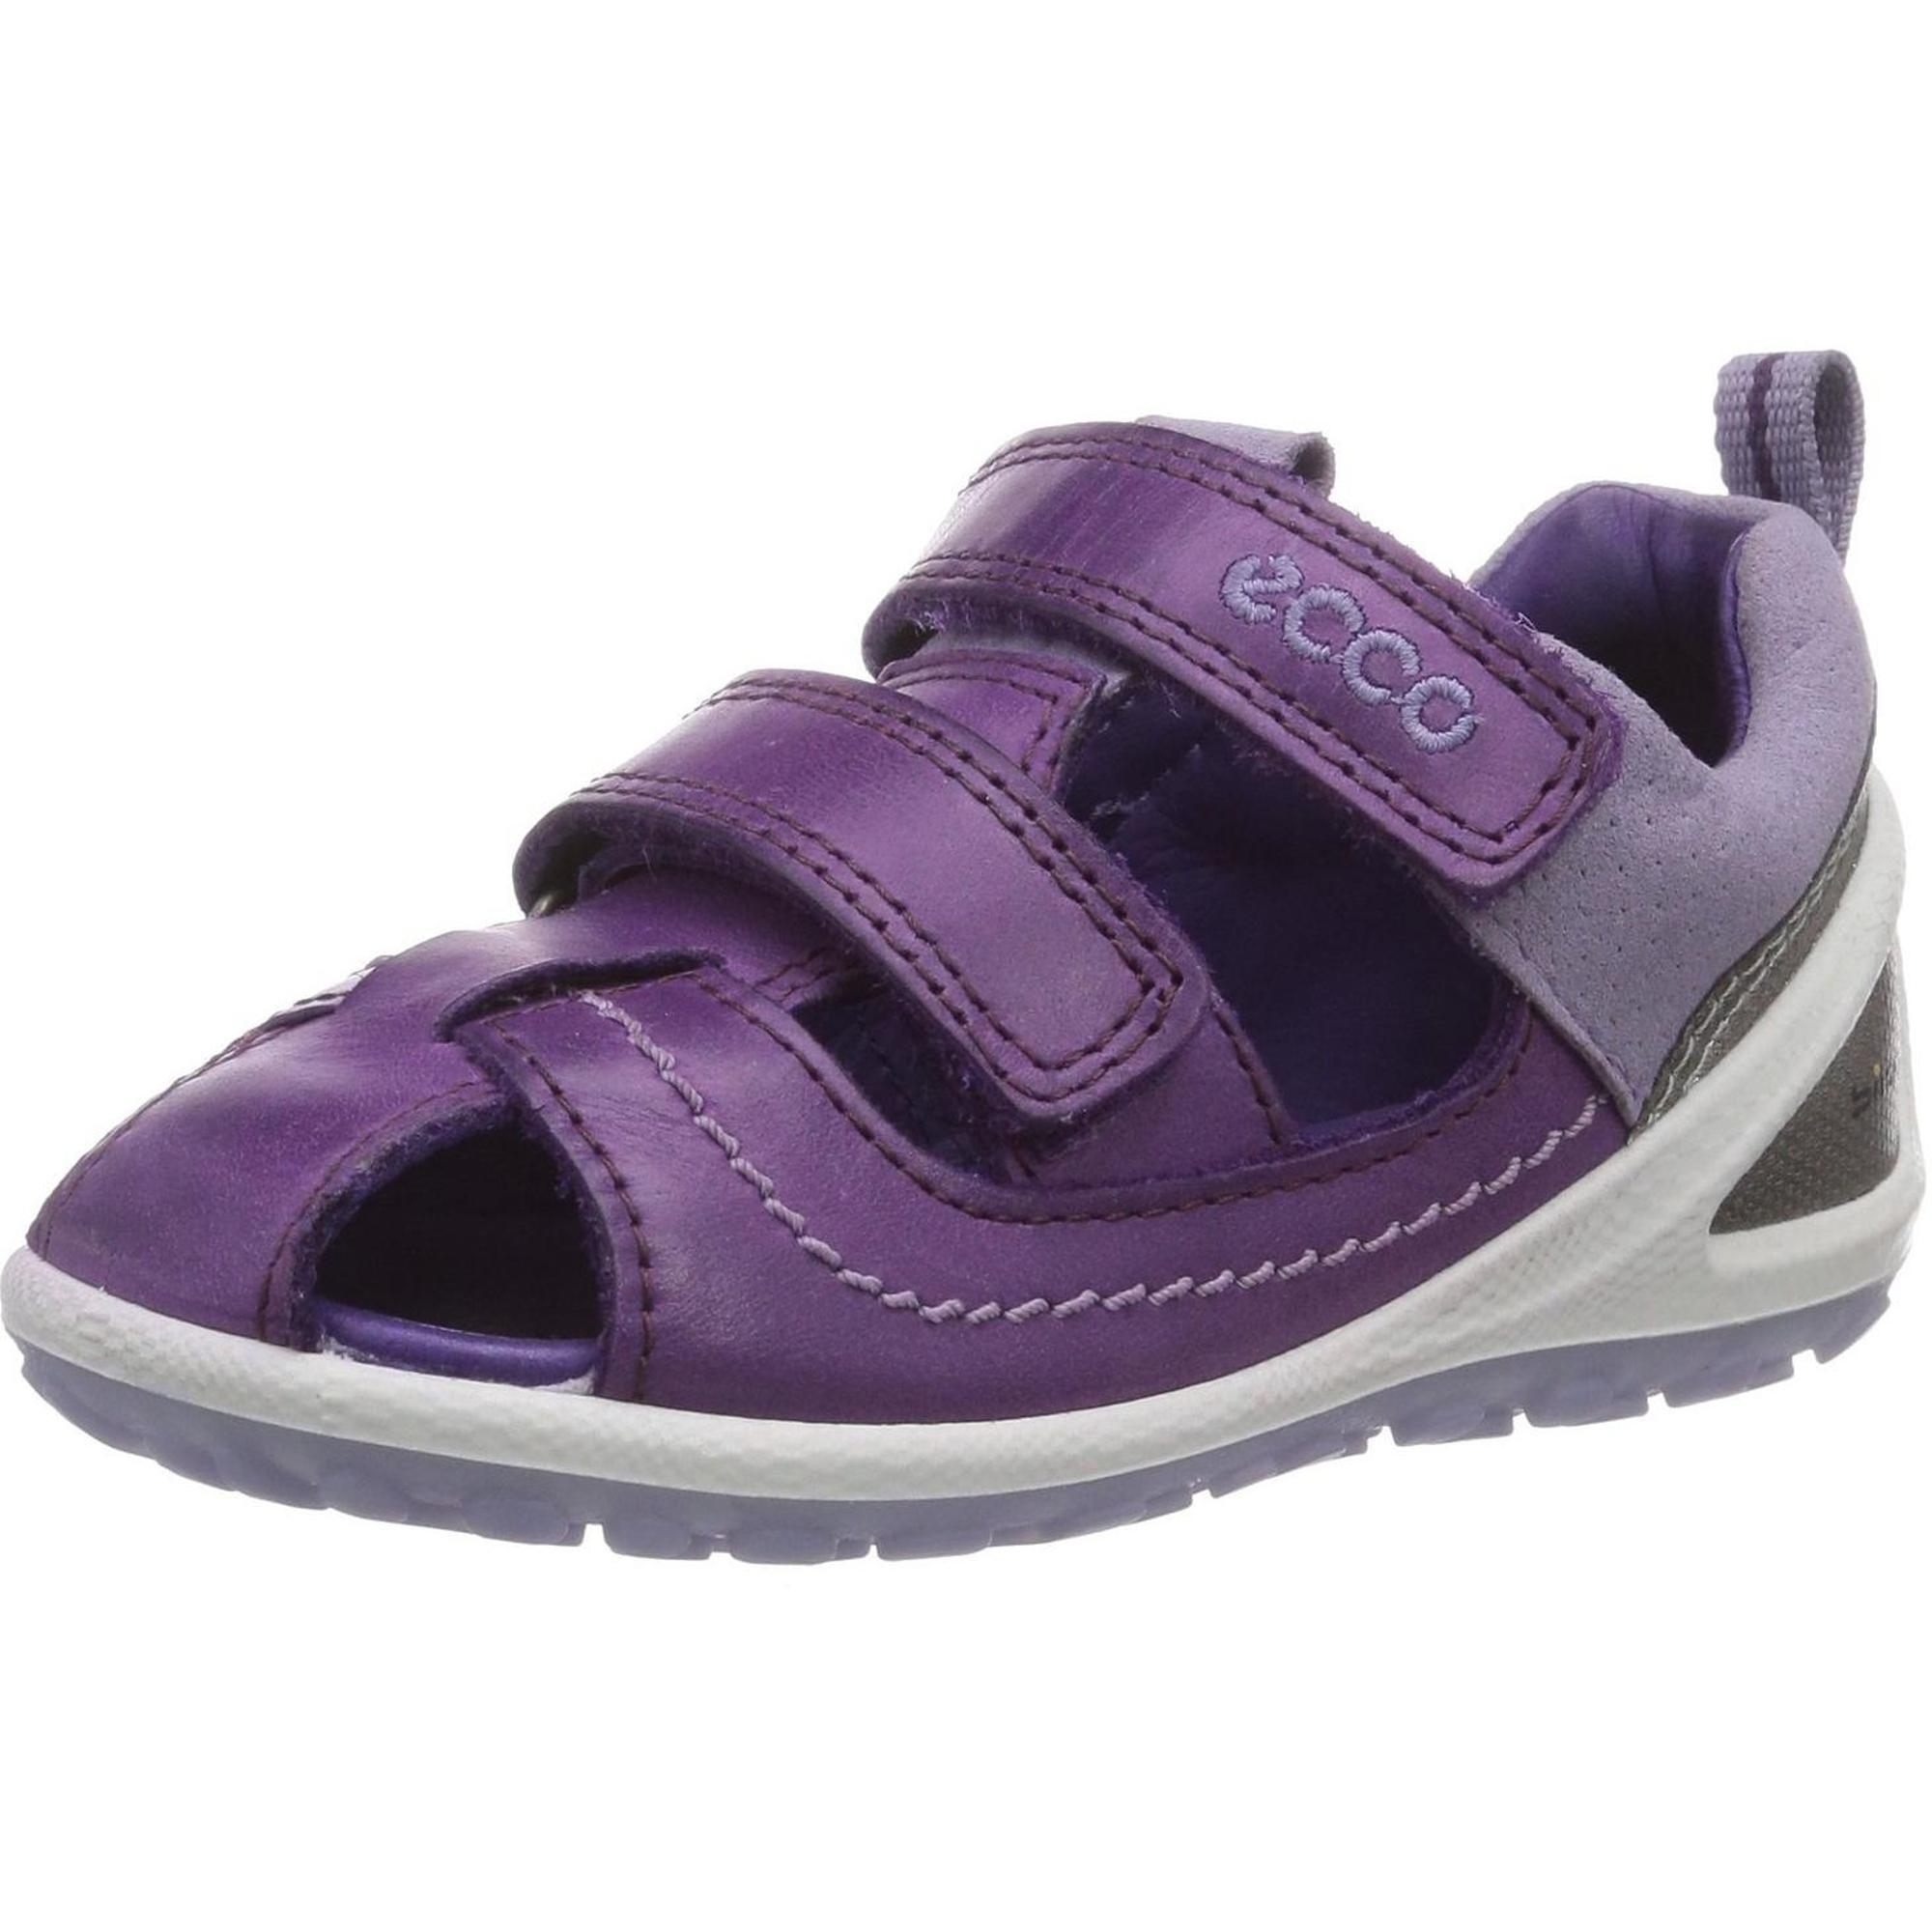 ecco toddler sandals